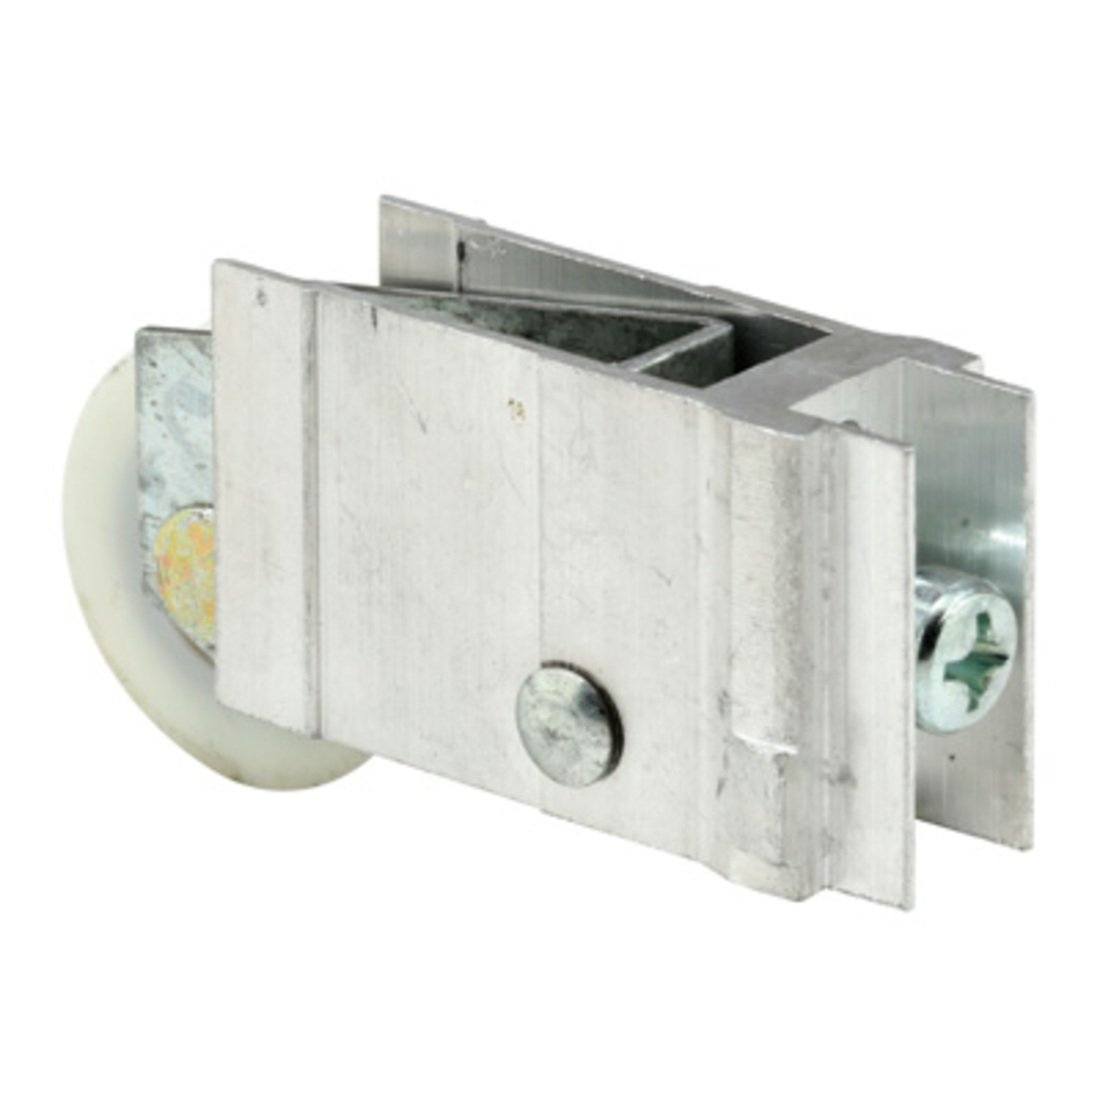 C.R LAURENCE D1953 CRL 1-1//4 Nylon Ball Bearing Sliding Glass Door Roller with 3//4 Wide Housing